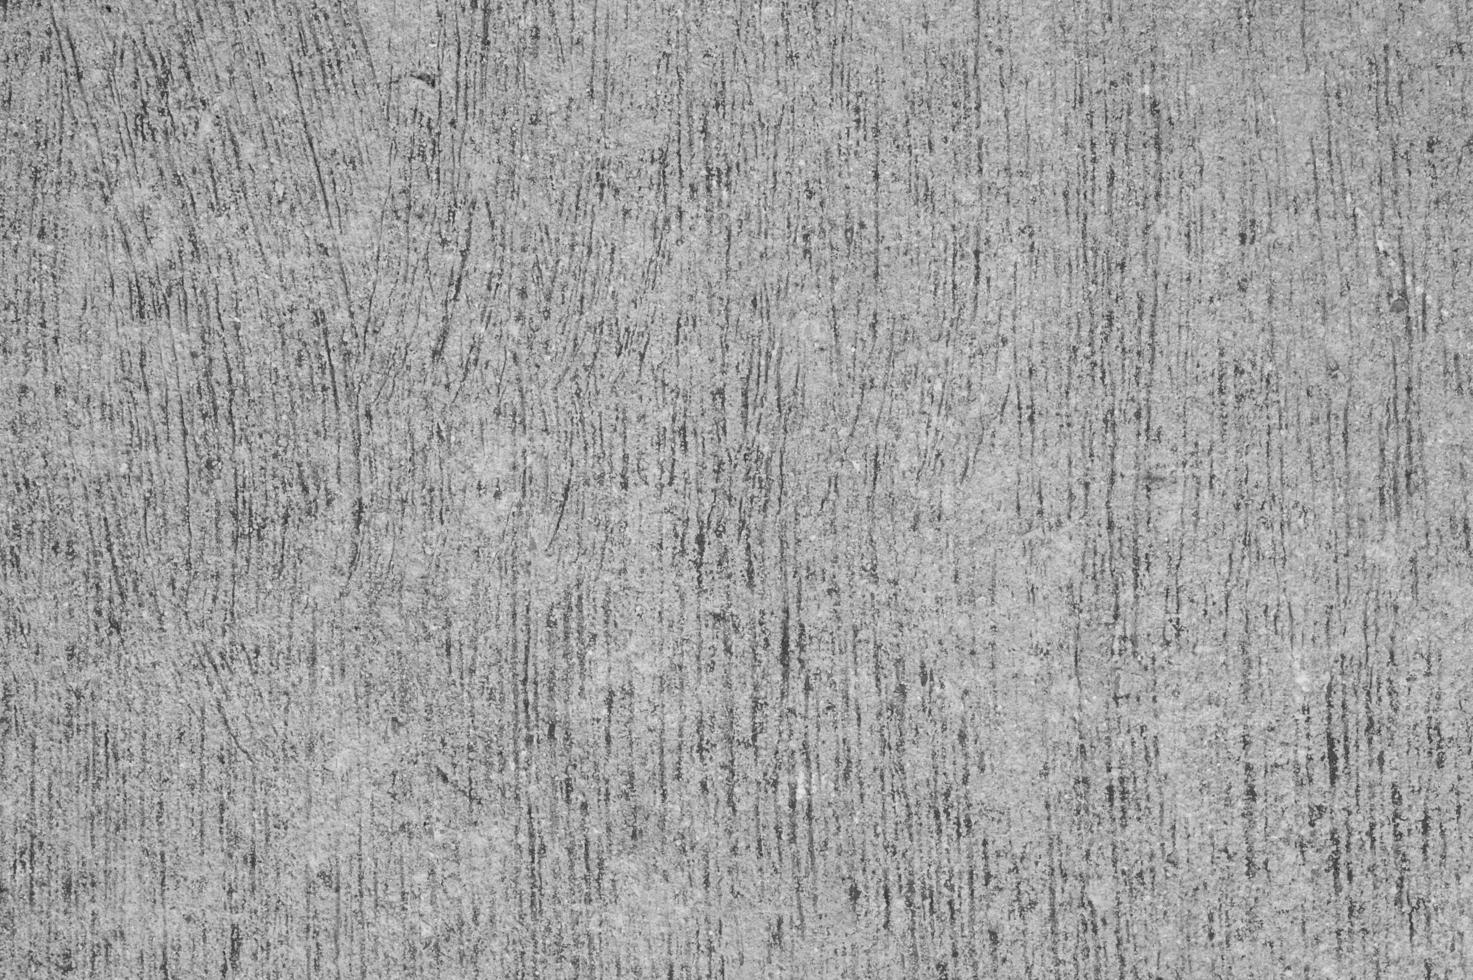 Concrete Texture, background photo